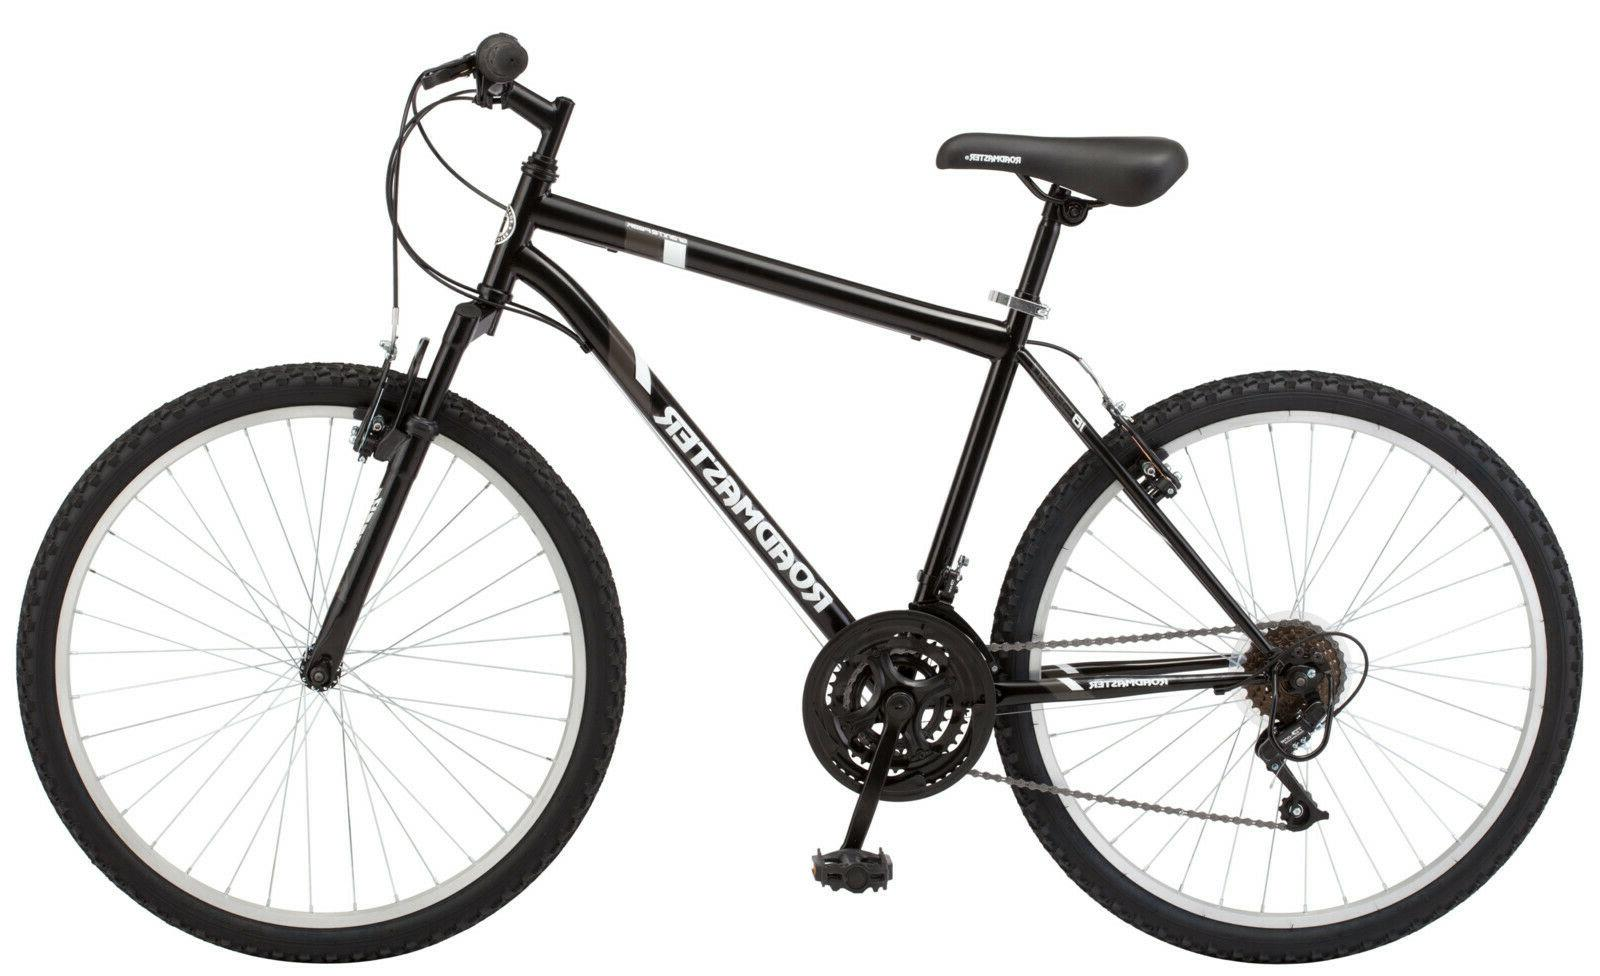 "Men/'s Mountain Bike 26/"" Inches Roadmaster Granite Peak Bicycle 18-speed"